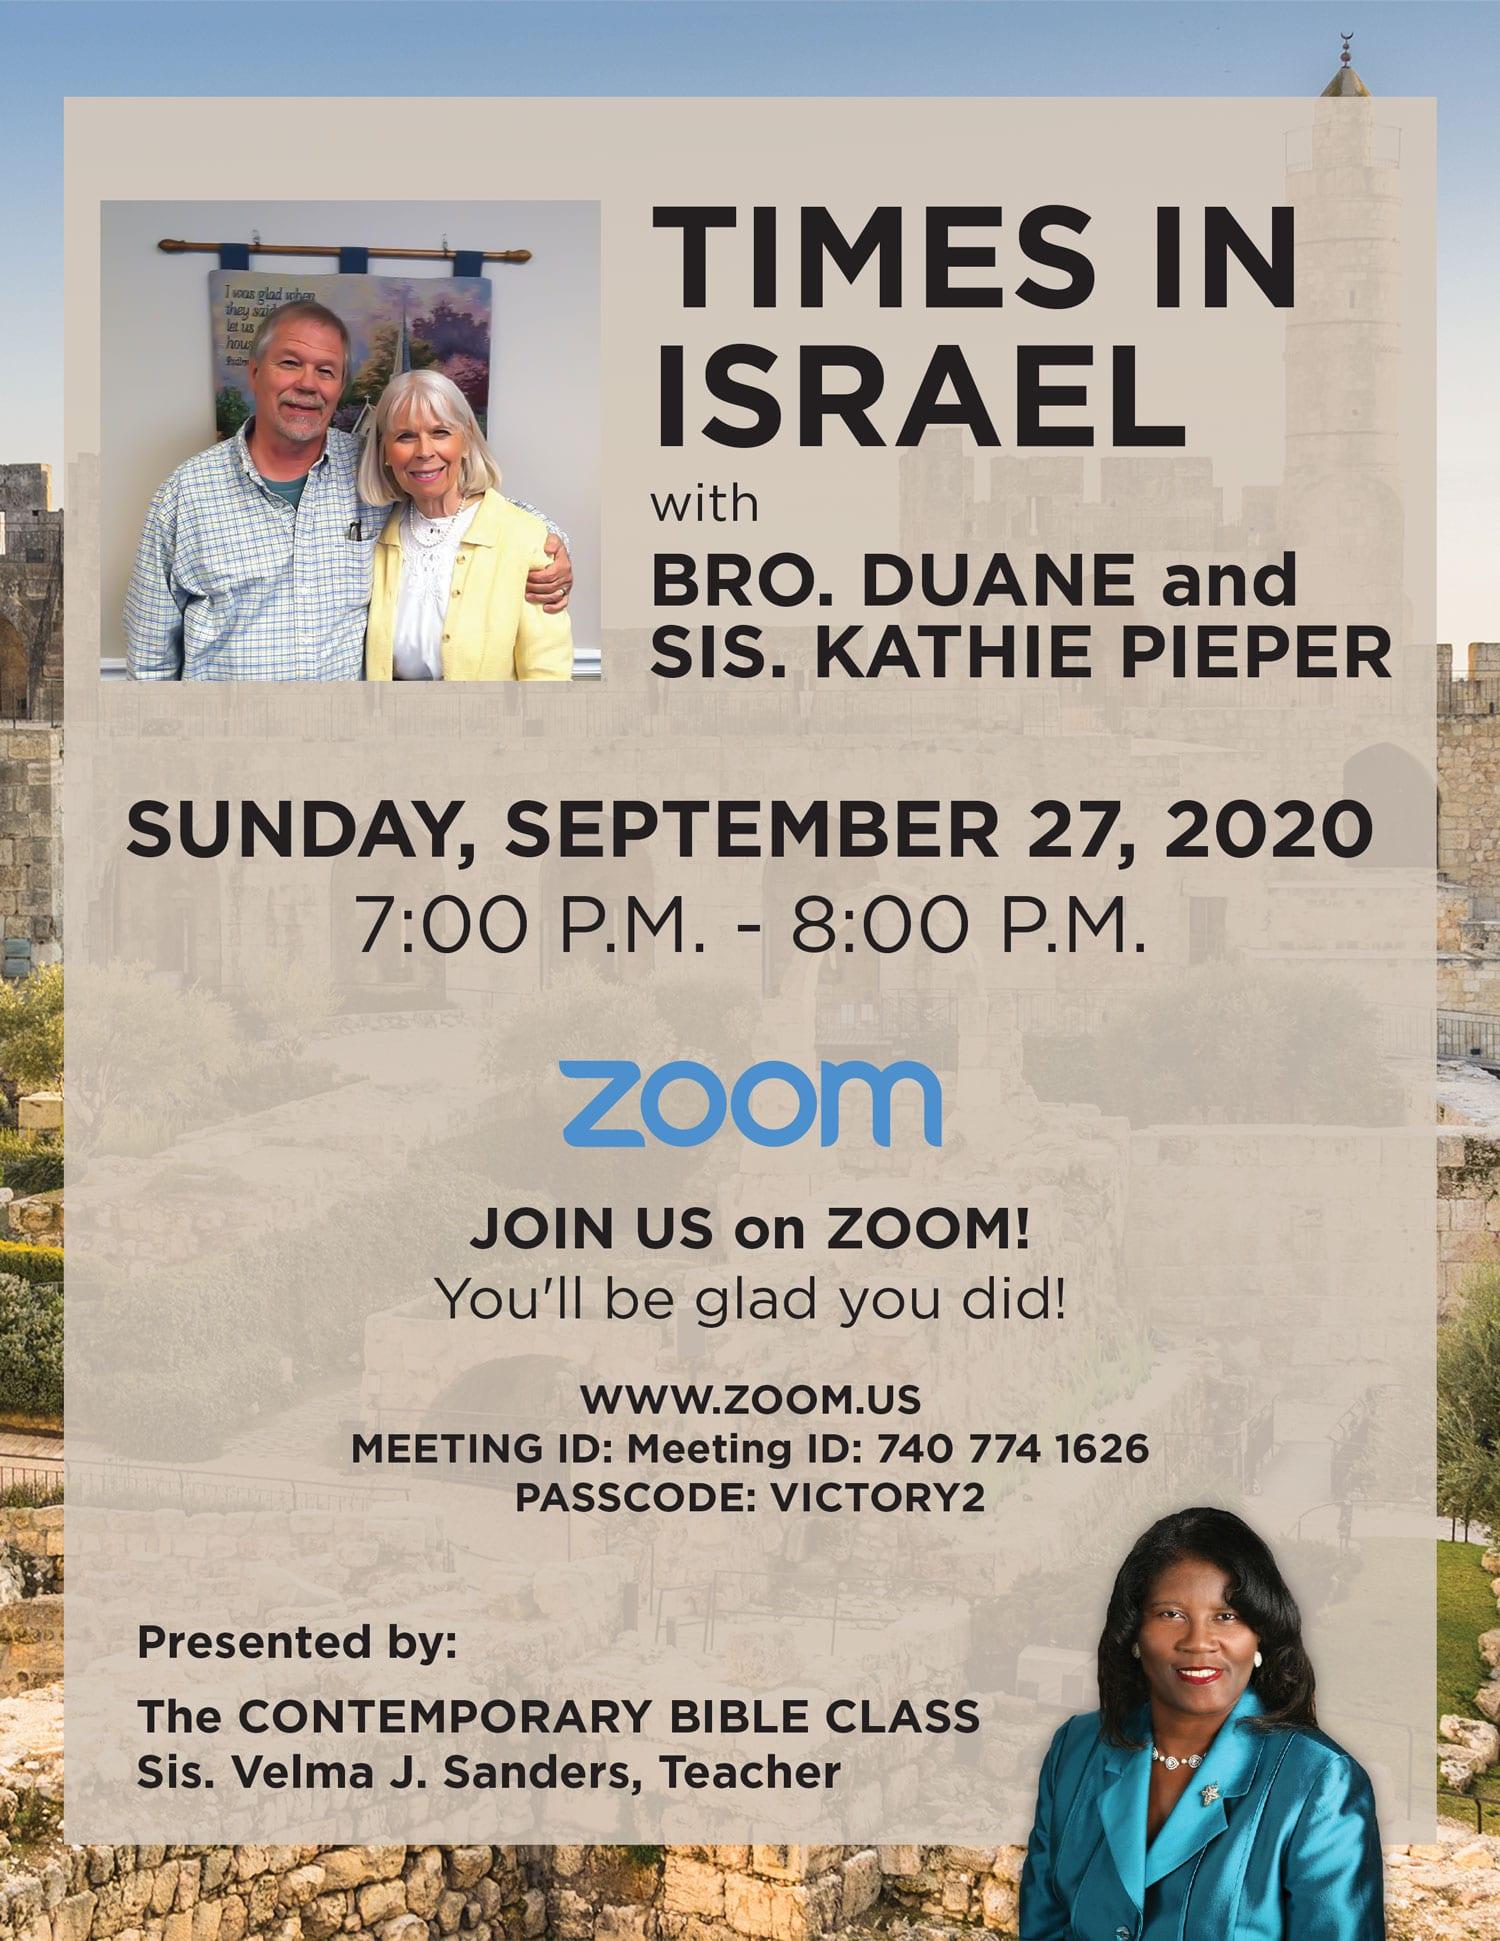 Times in Israel Flyer